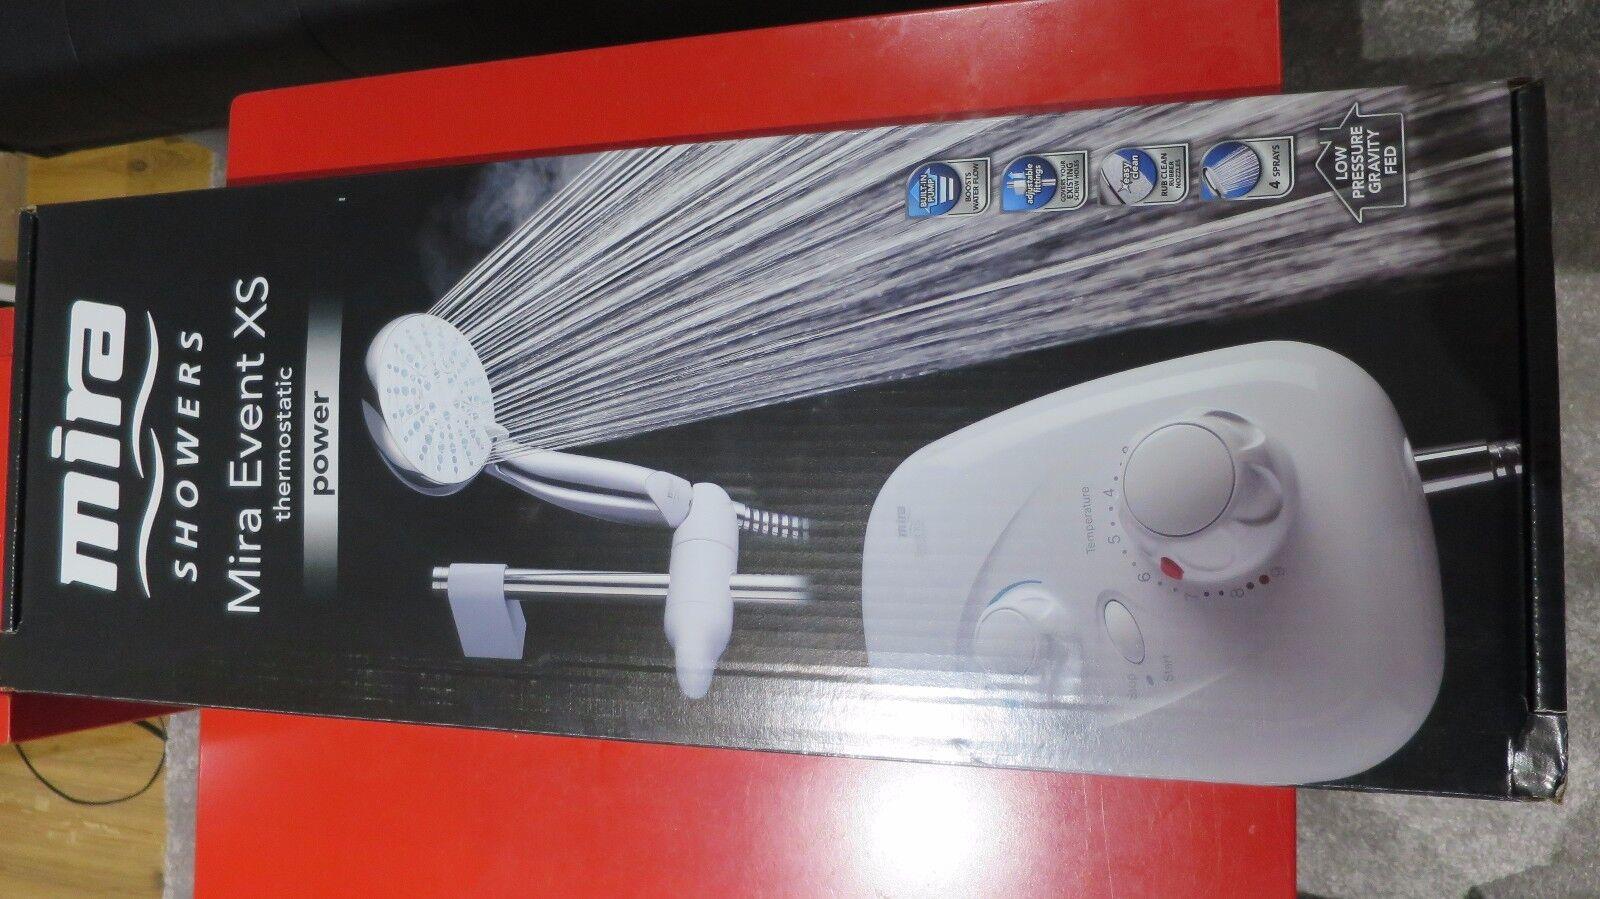 Mira Event XS thermostatique Blanc, Chrome Power Shower 1.1532.400